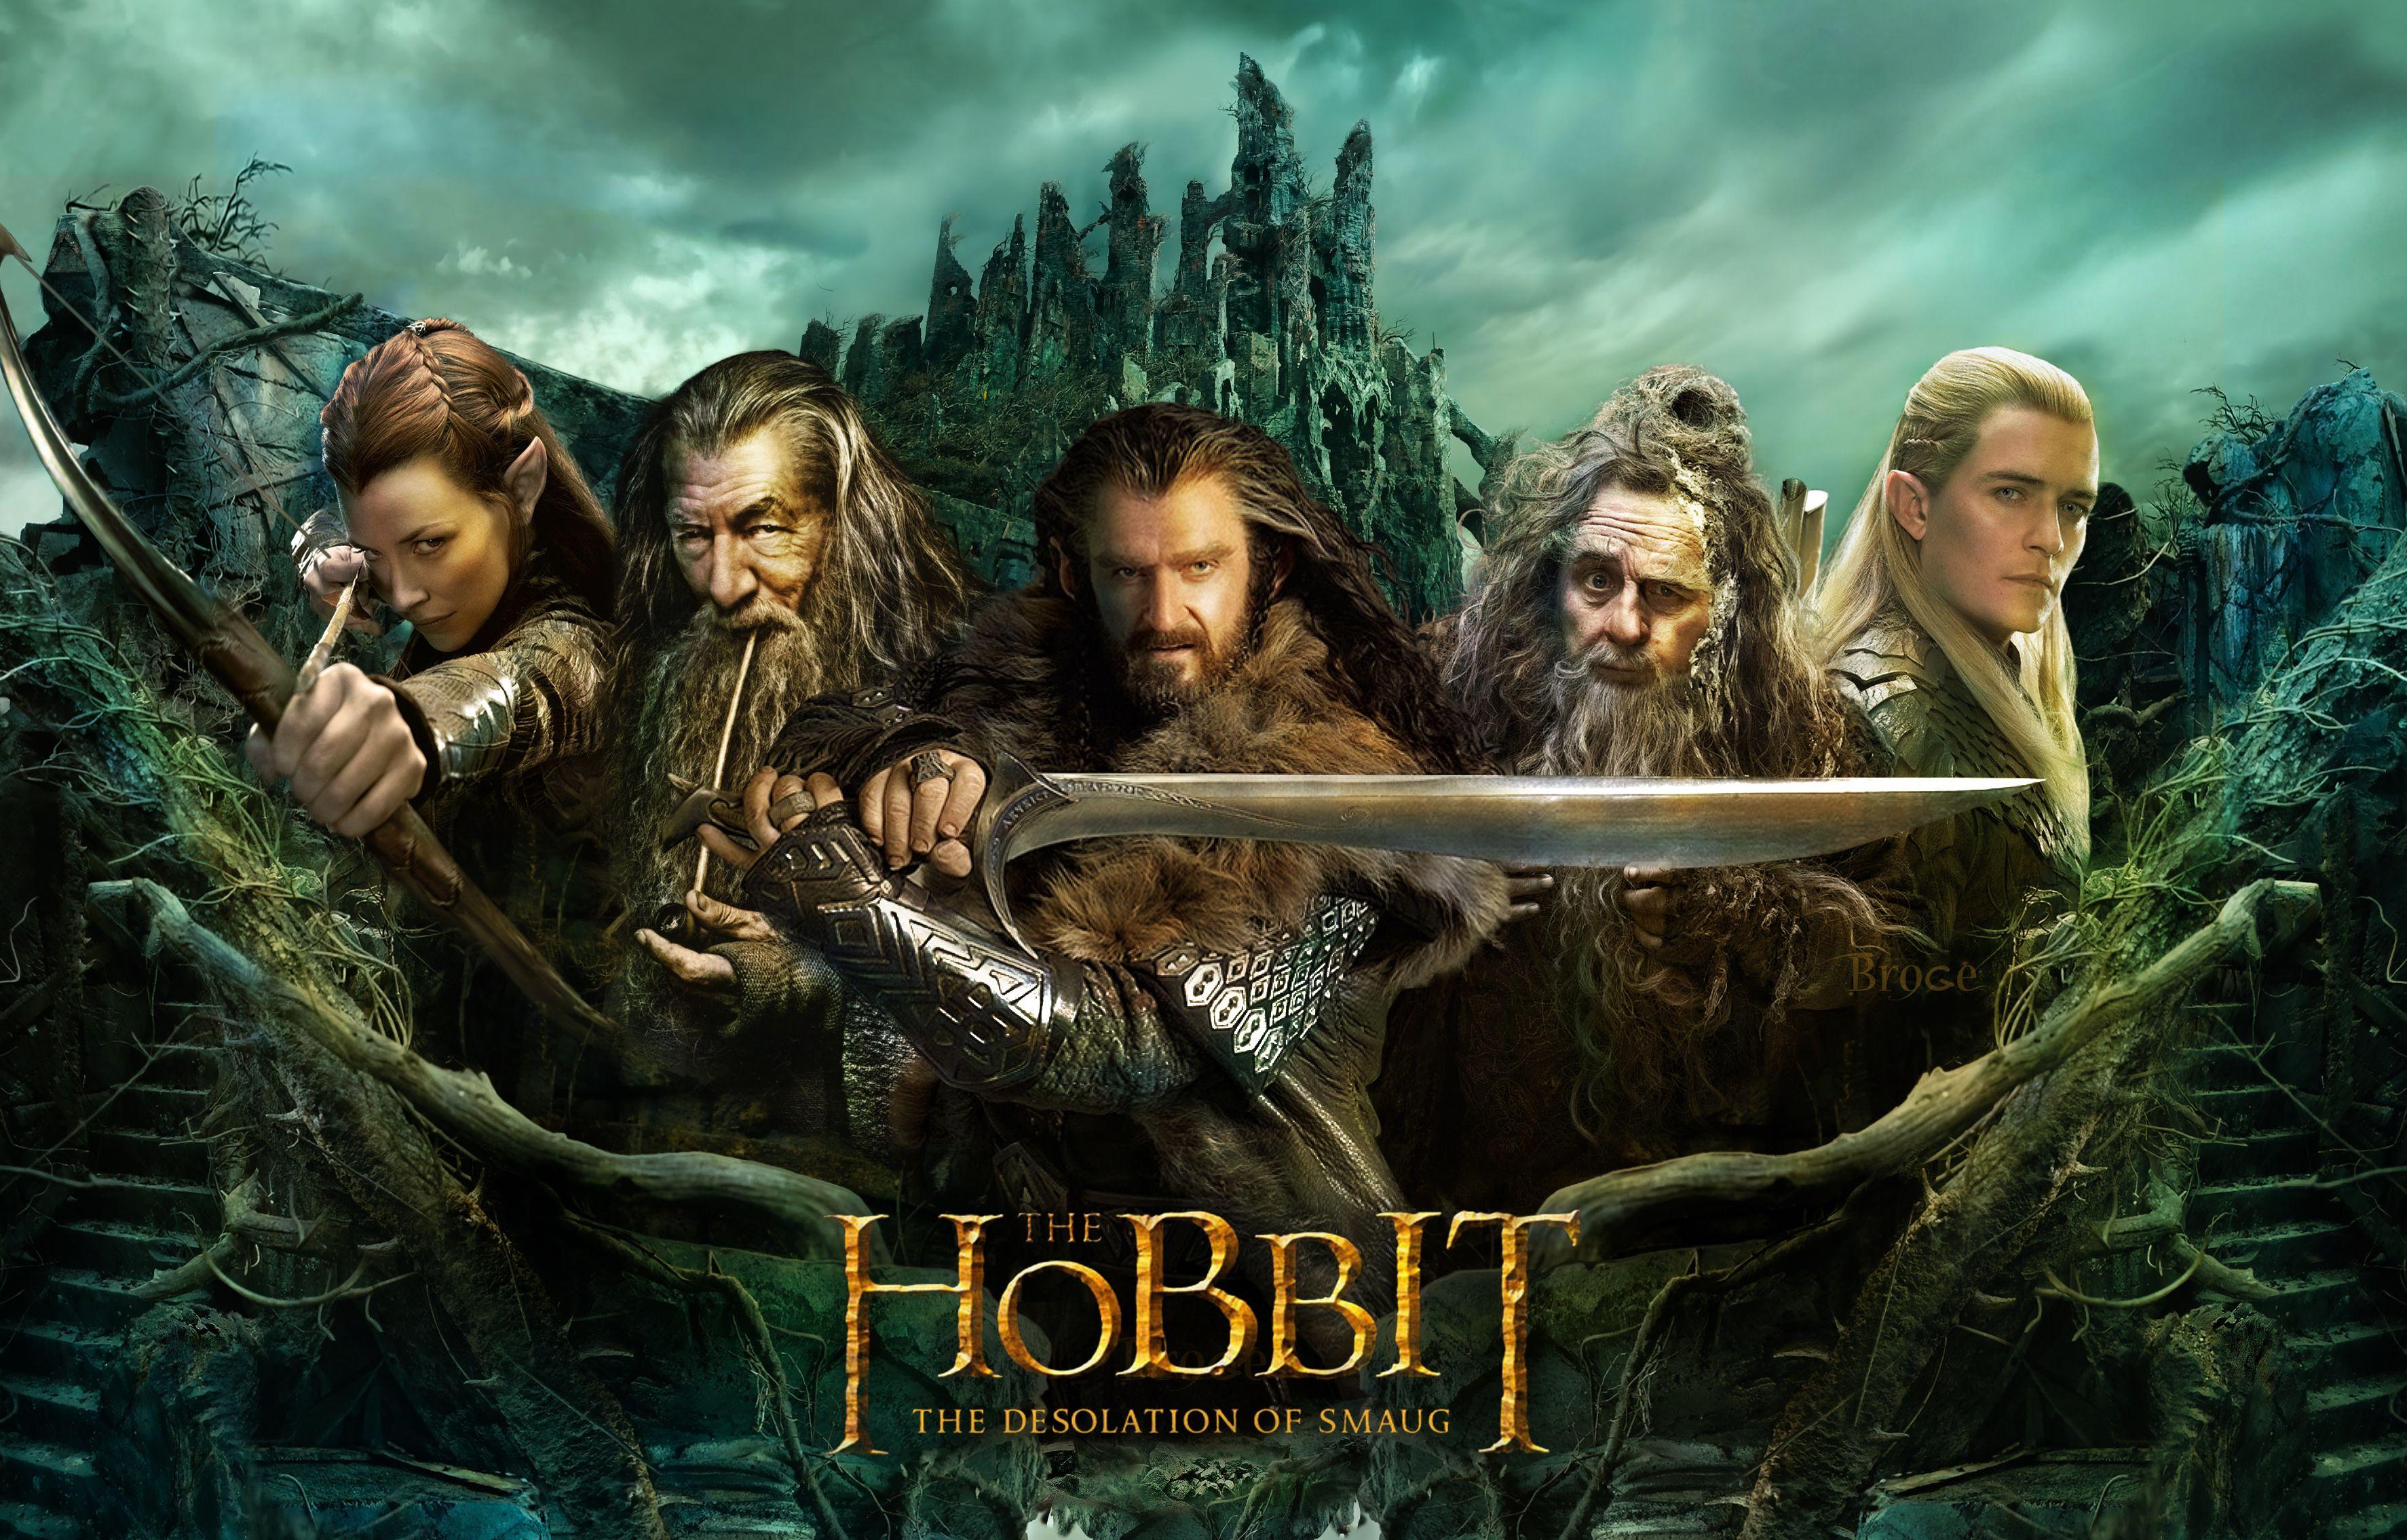 Lord Of The Rings Photo The Hobbit The Desolation Of Smaug La Desolación De Smaug Hobbit Noticias De Cine